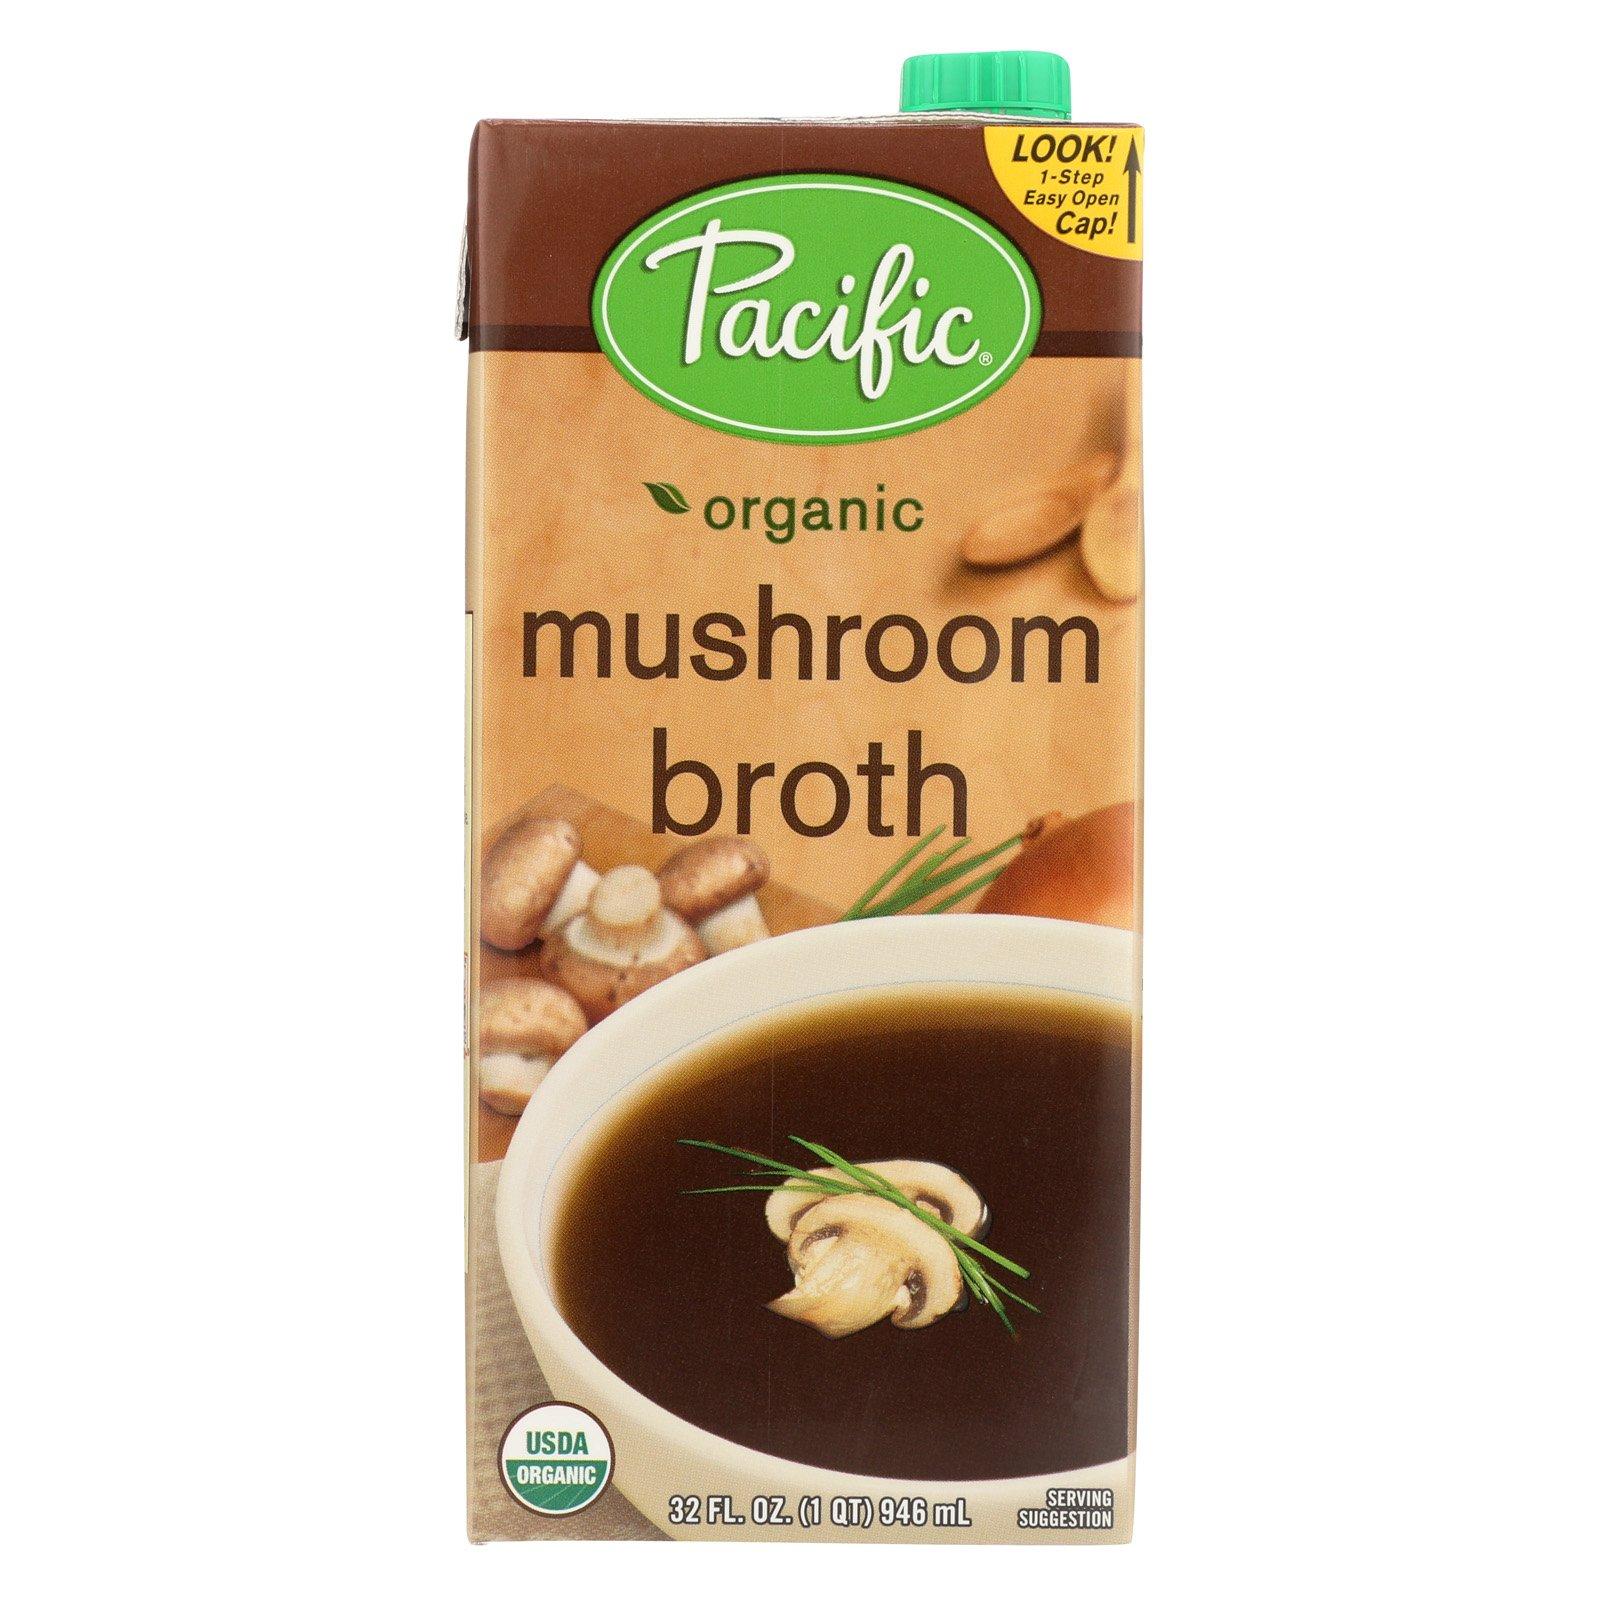 Pacific Natural Foods Mushroom Broth - Organic - Case of 12 - 32 Fl oz.